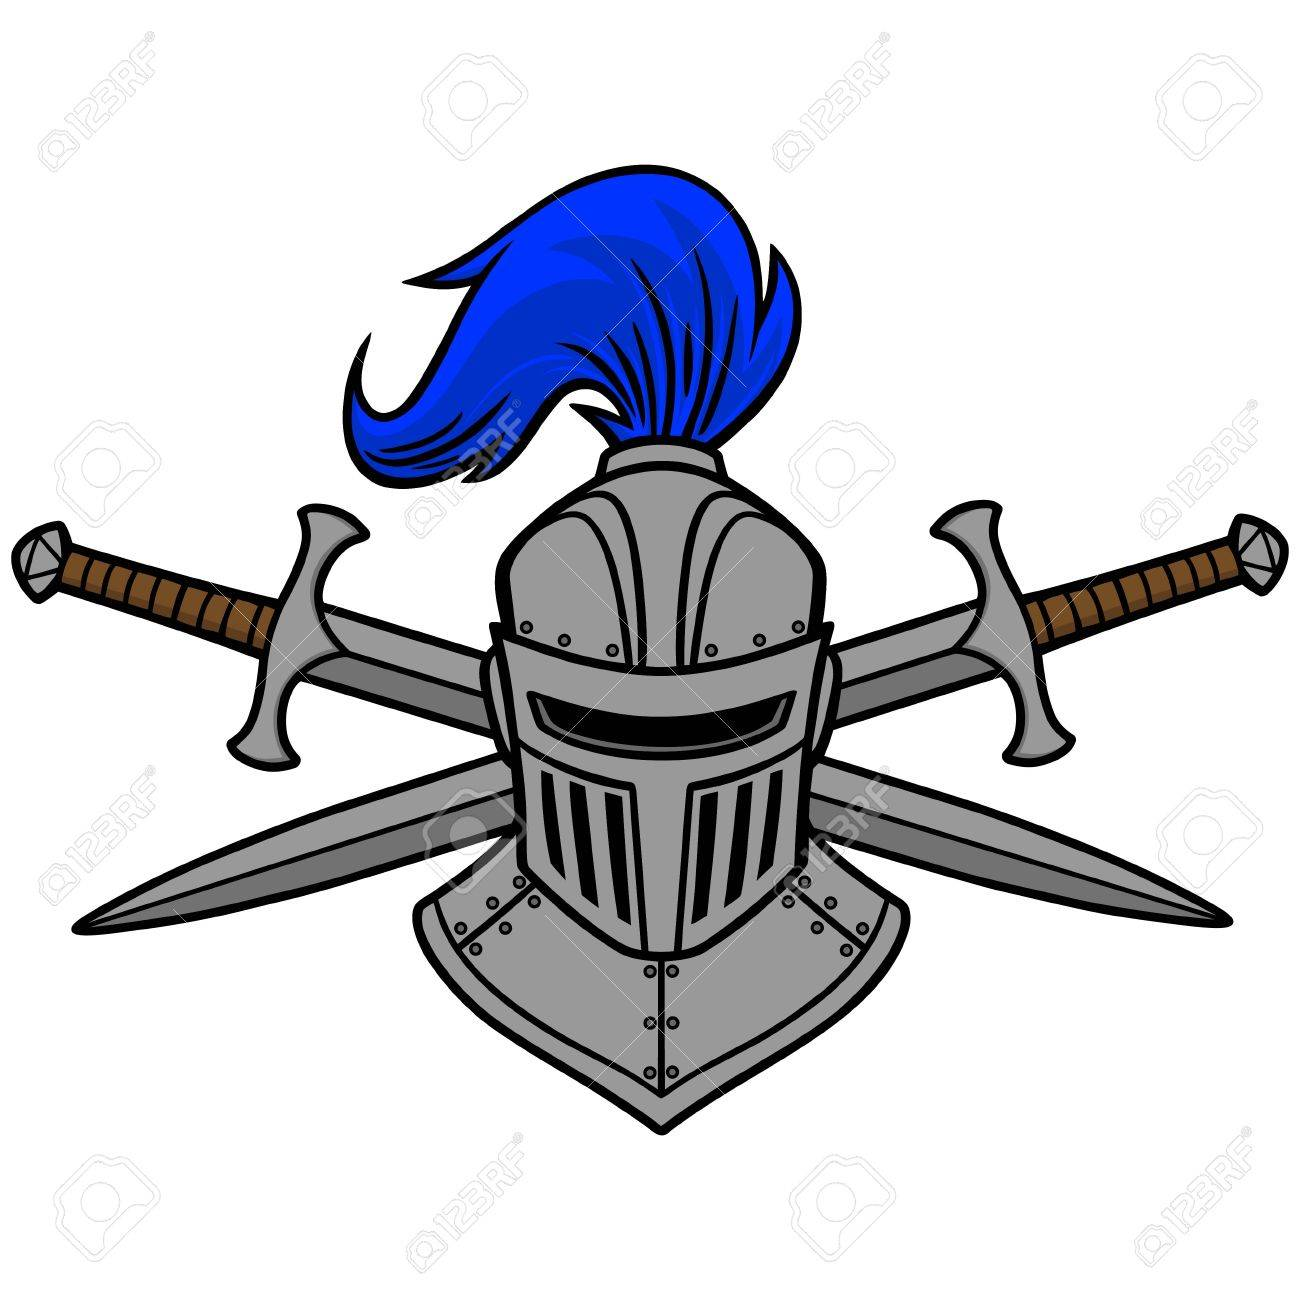 Knight Helmet and Crossed Swords.